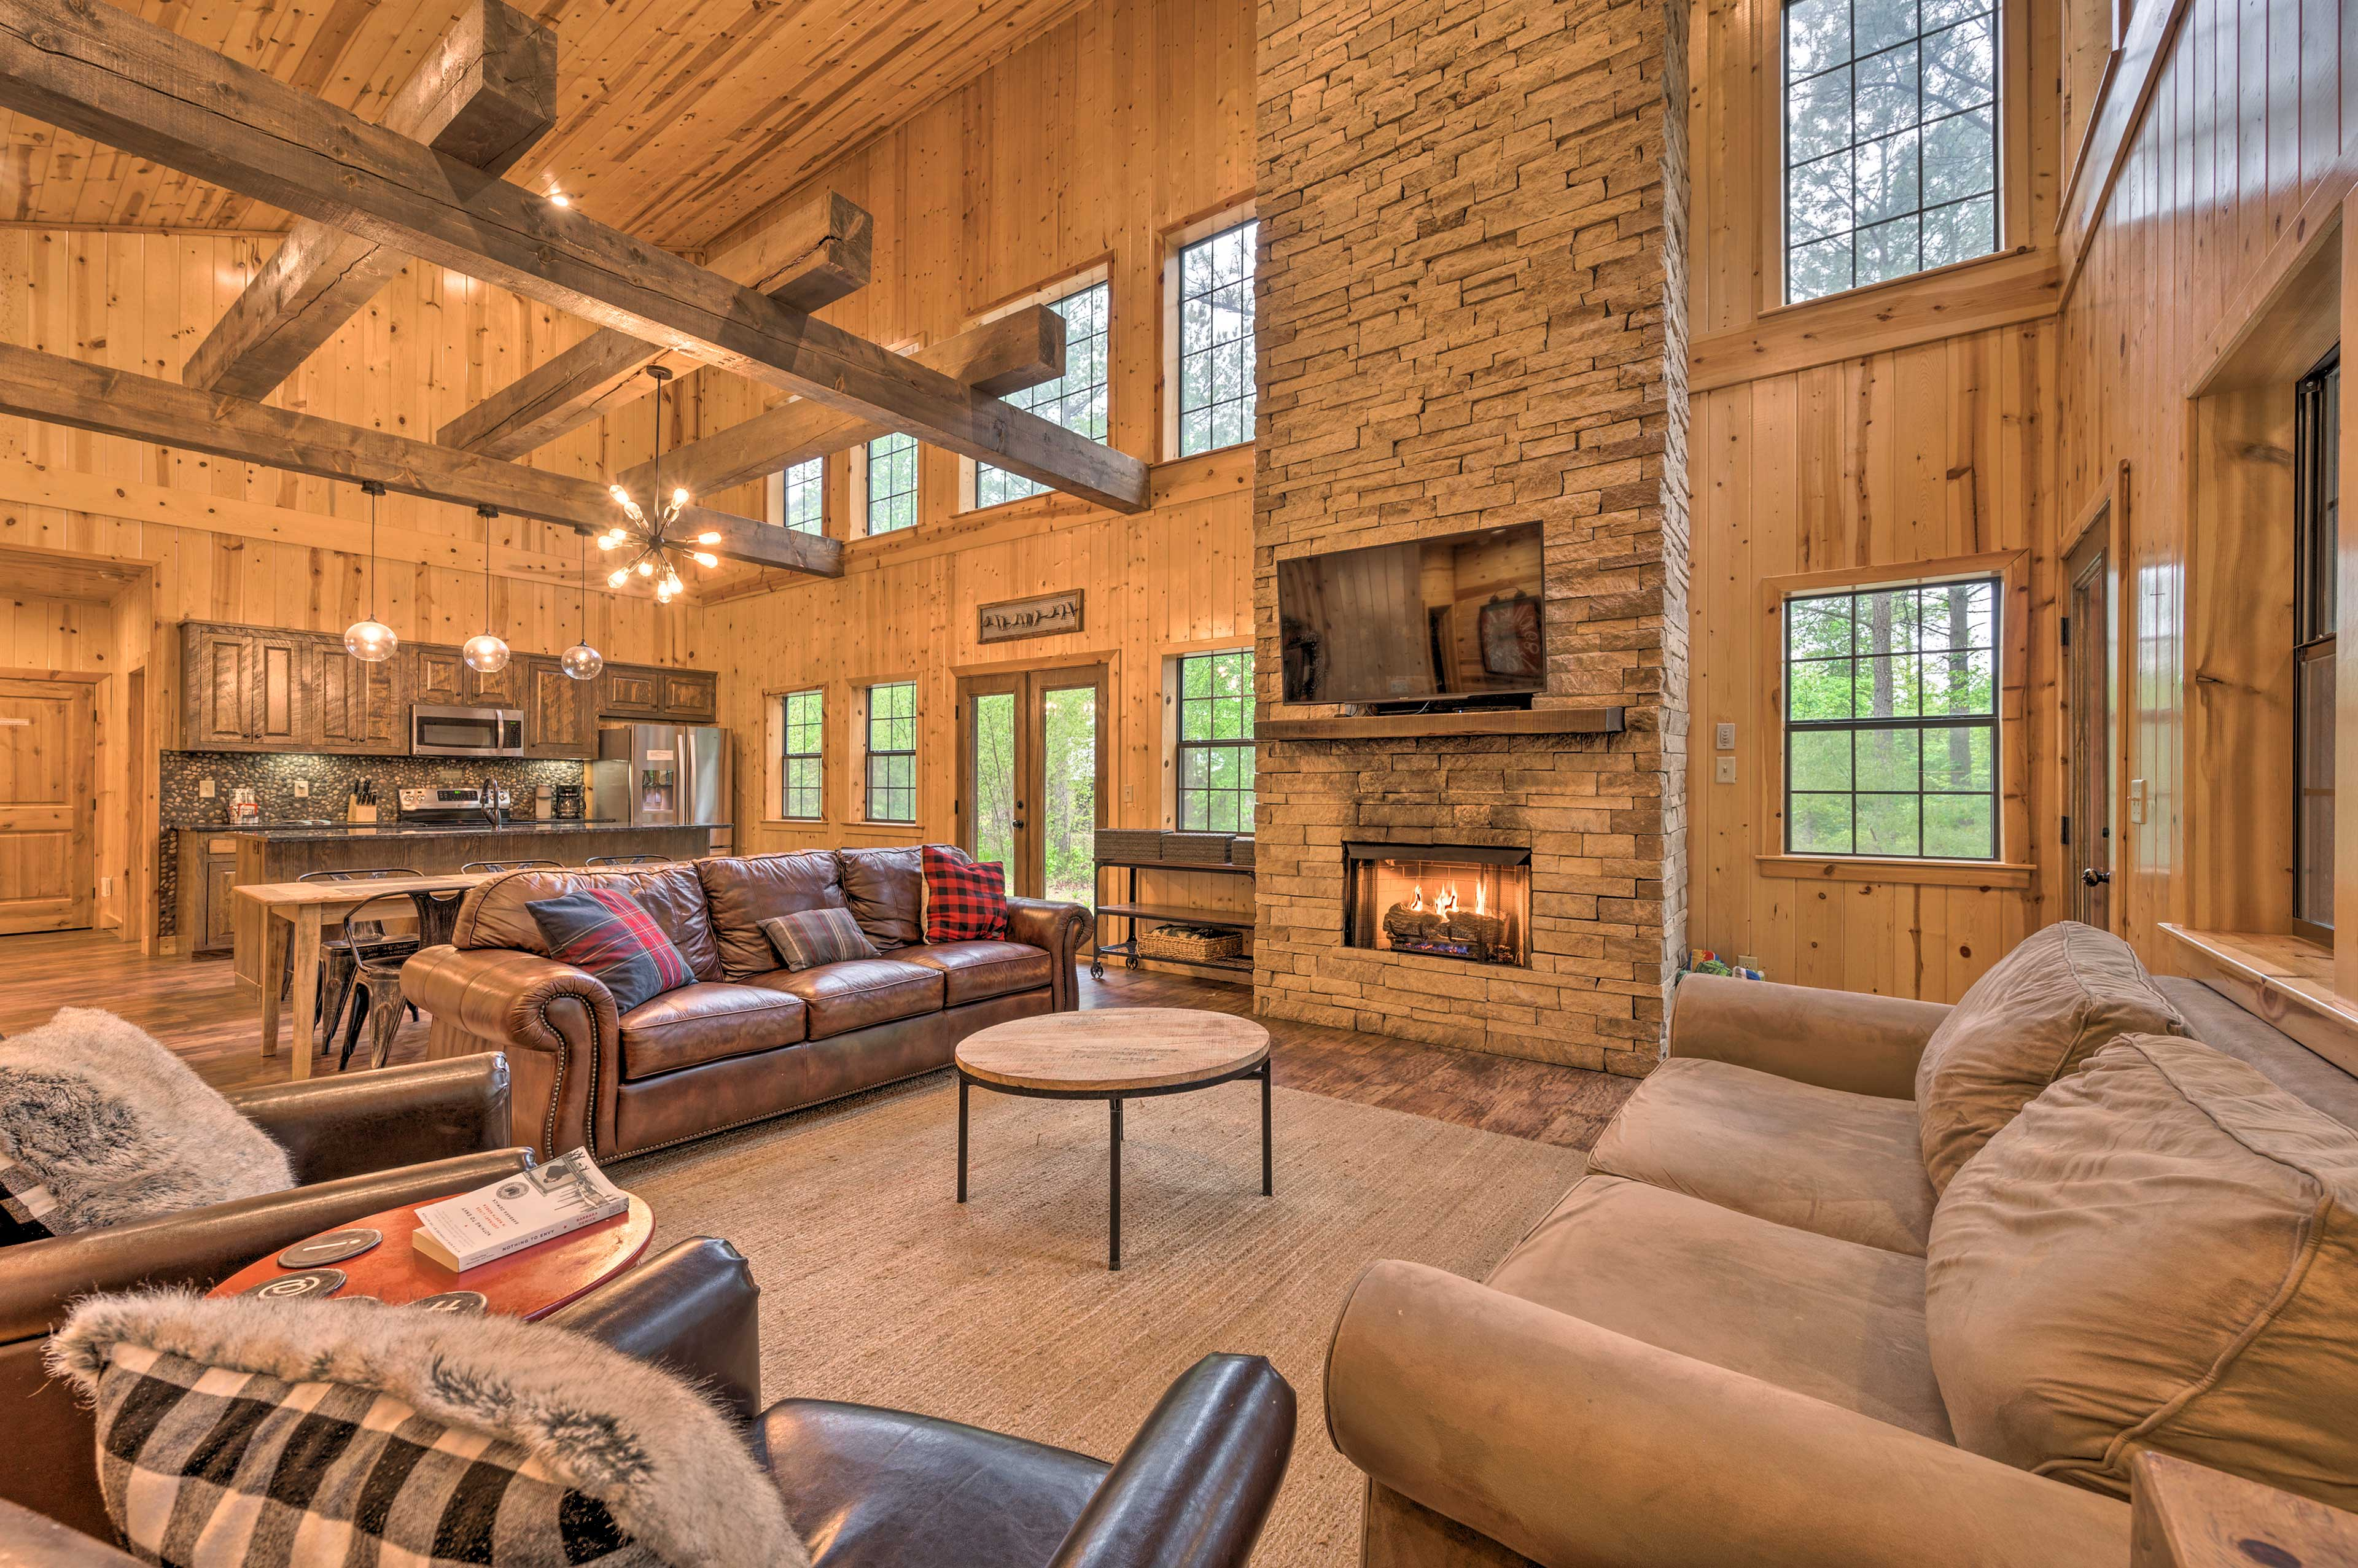 Broken Bow Vacation Rental Home | 4BR | 3BA | 1,750 Sq Ft | Step-Free Access